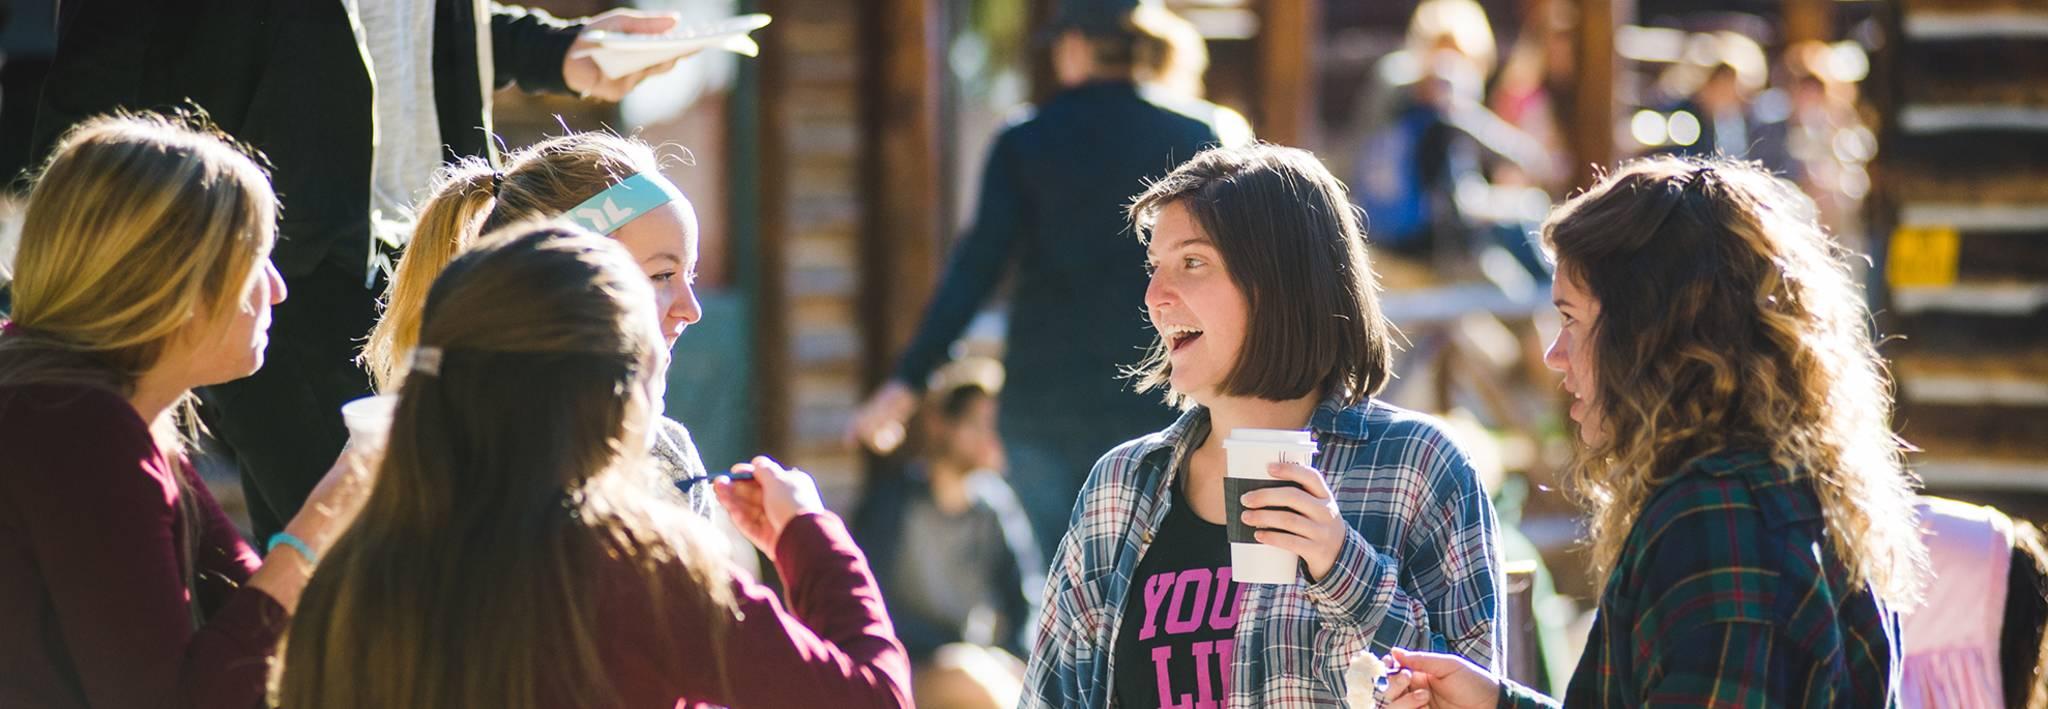 CCU students having a conversation at New Student Retreat.